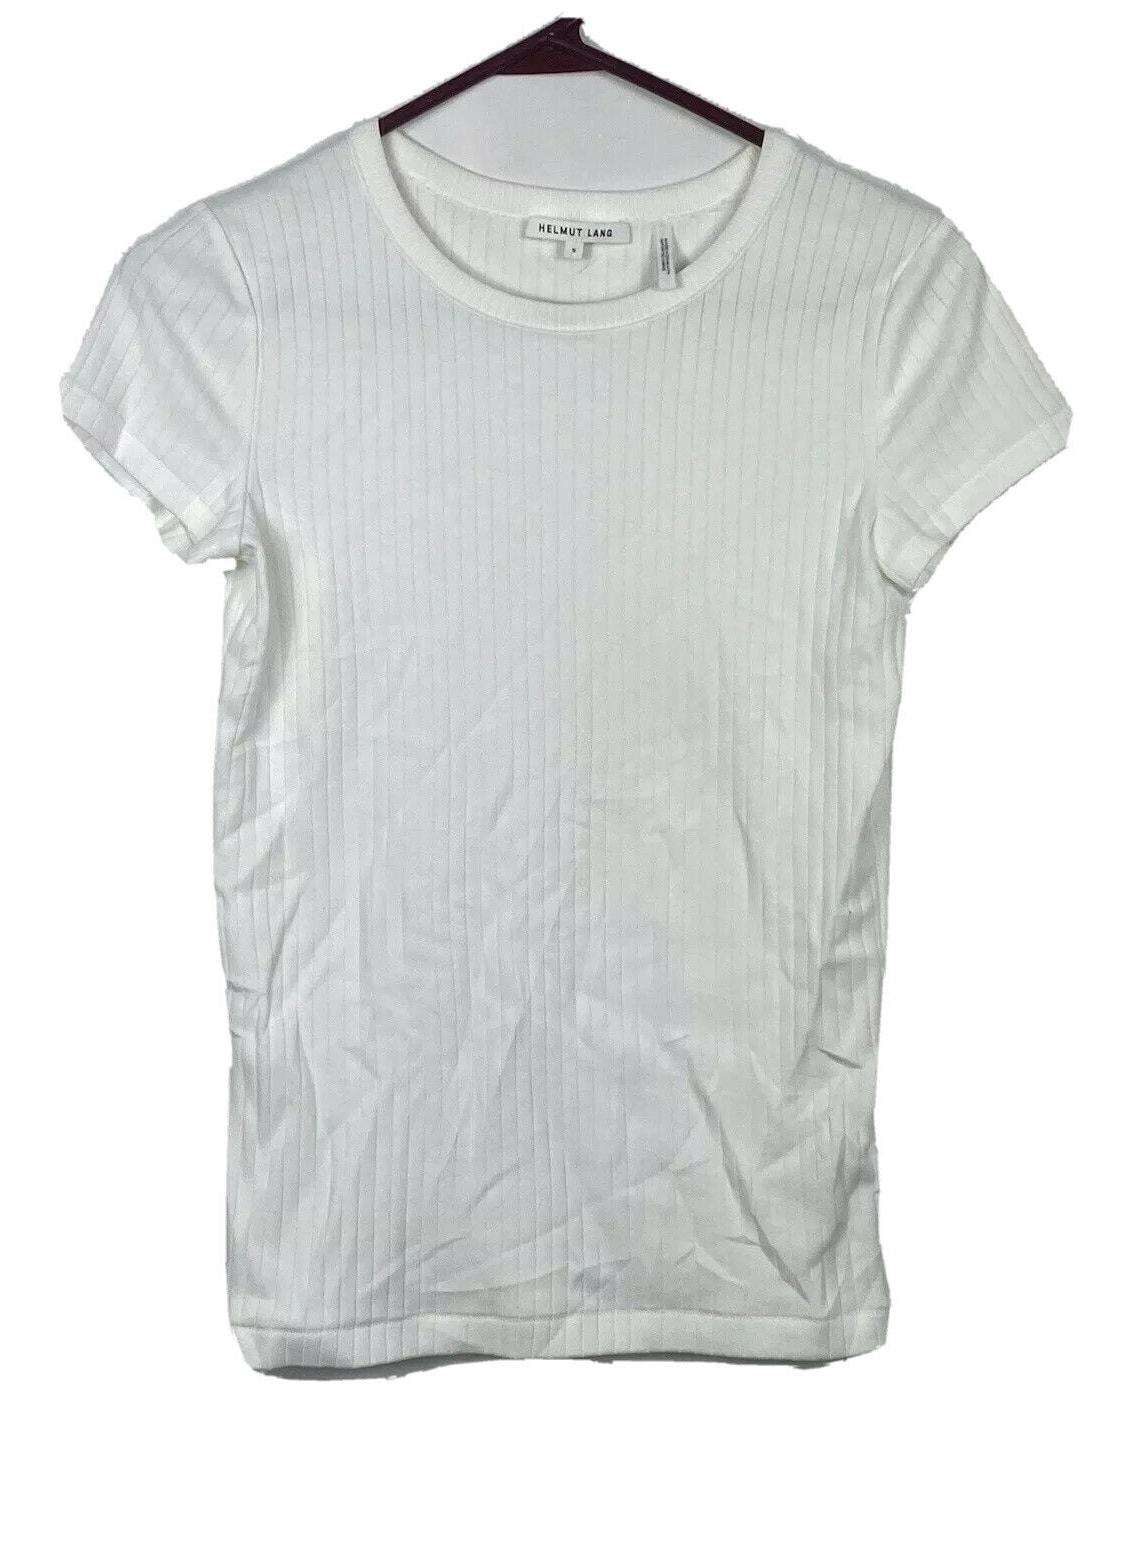 Helmut Lang Designer Womens Super stretch White Rib Baby Tee (Size S) MINT! *F